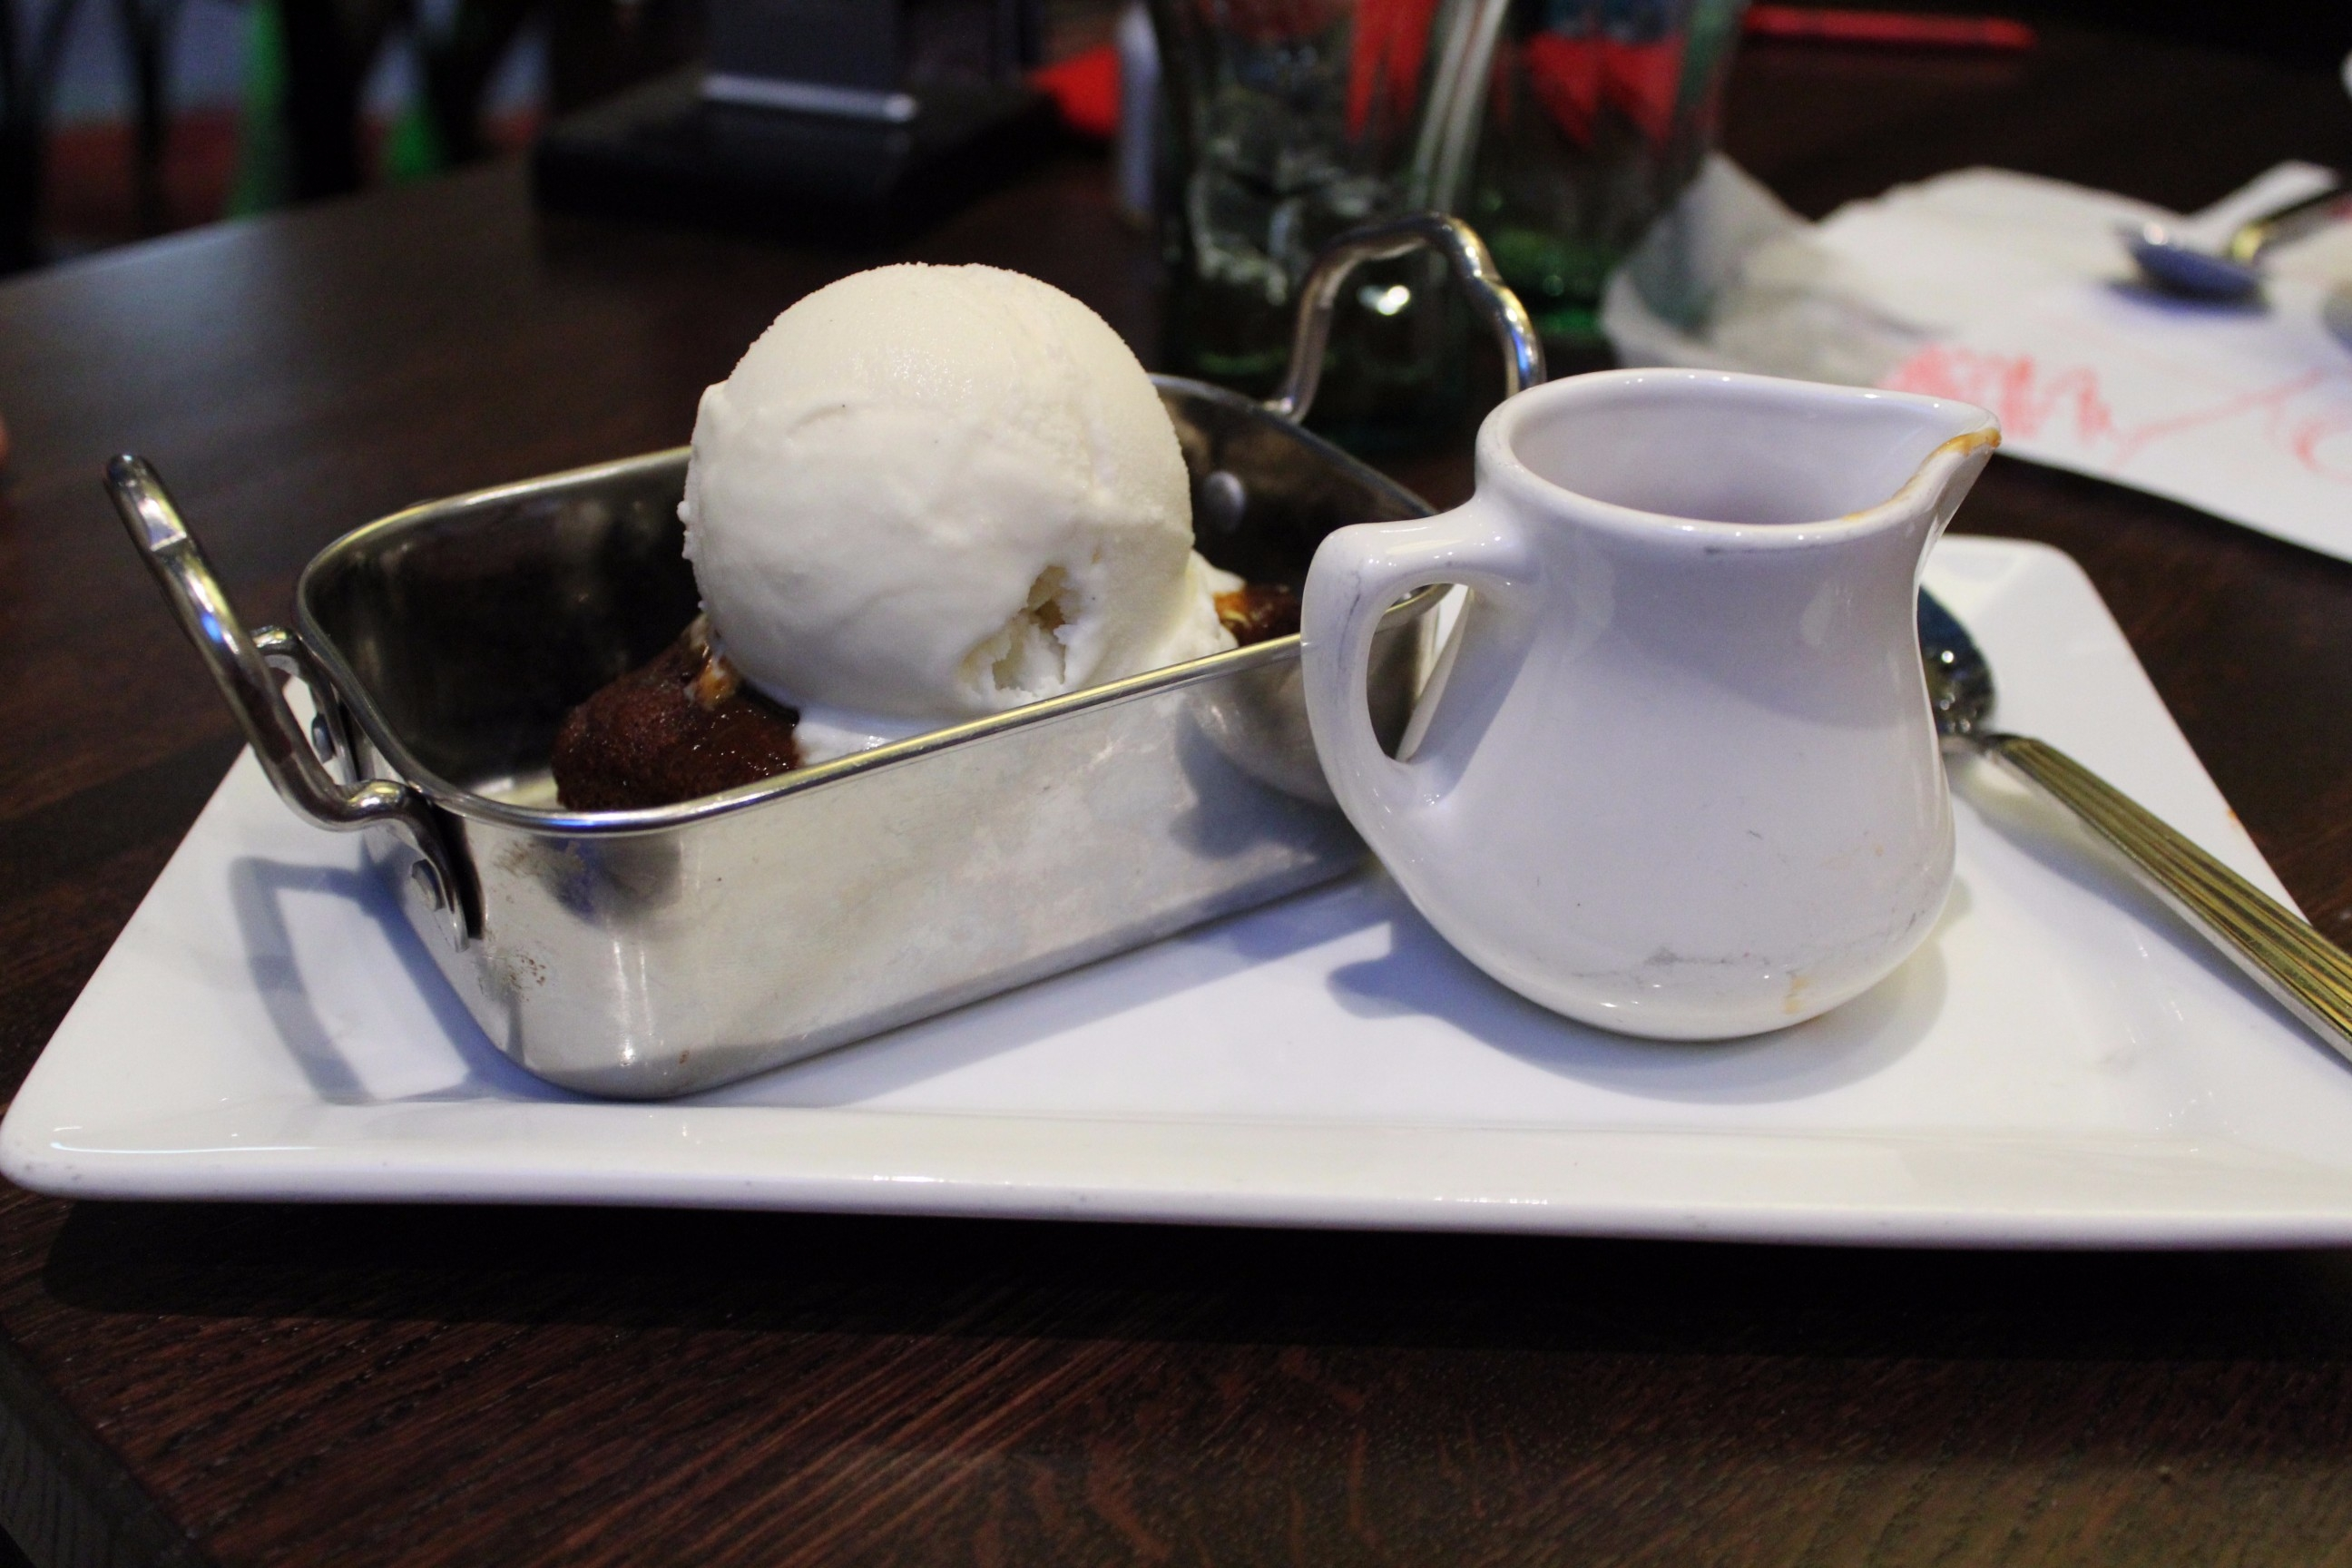 Planet-Hollywood-Disney-Springs-Orlando-Food-Photos-Review (11)